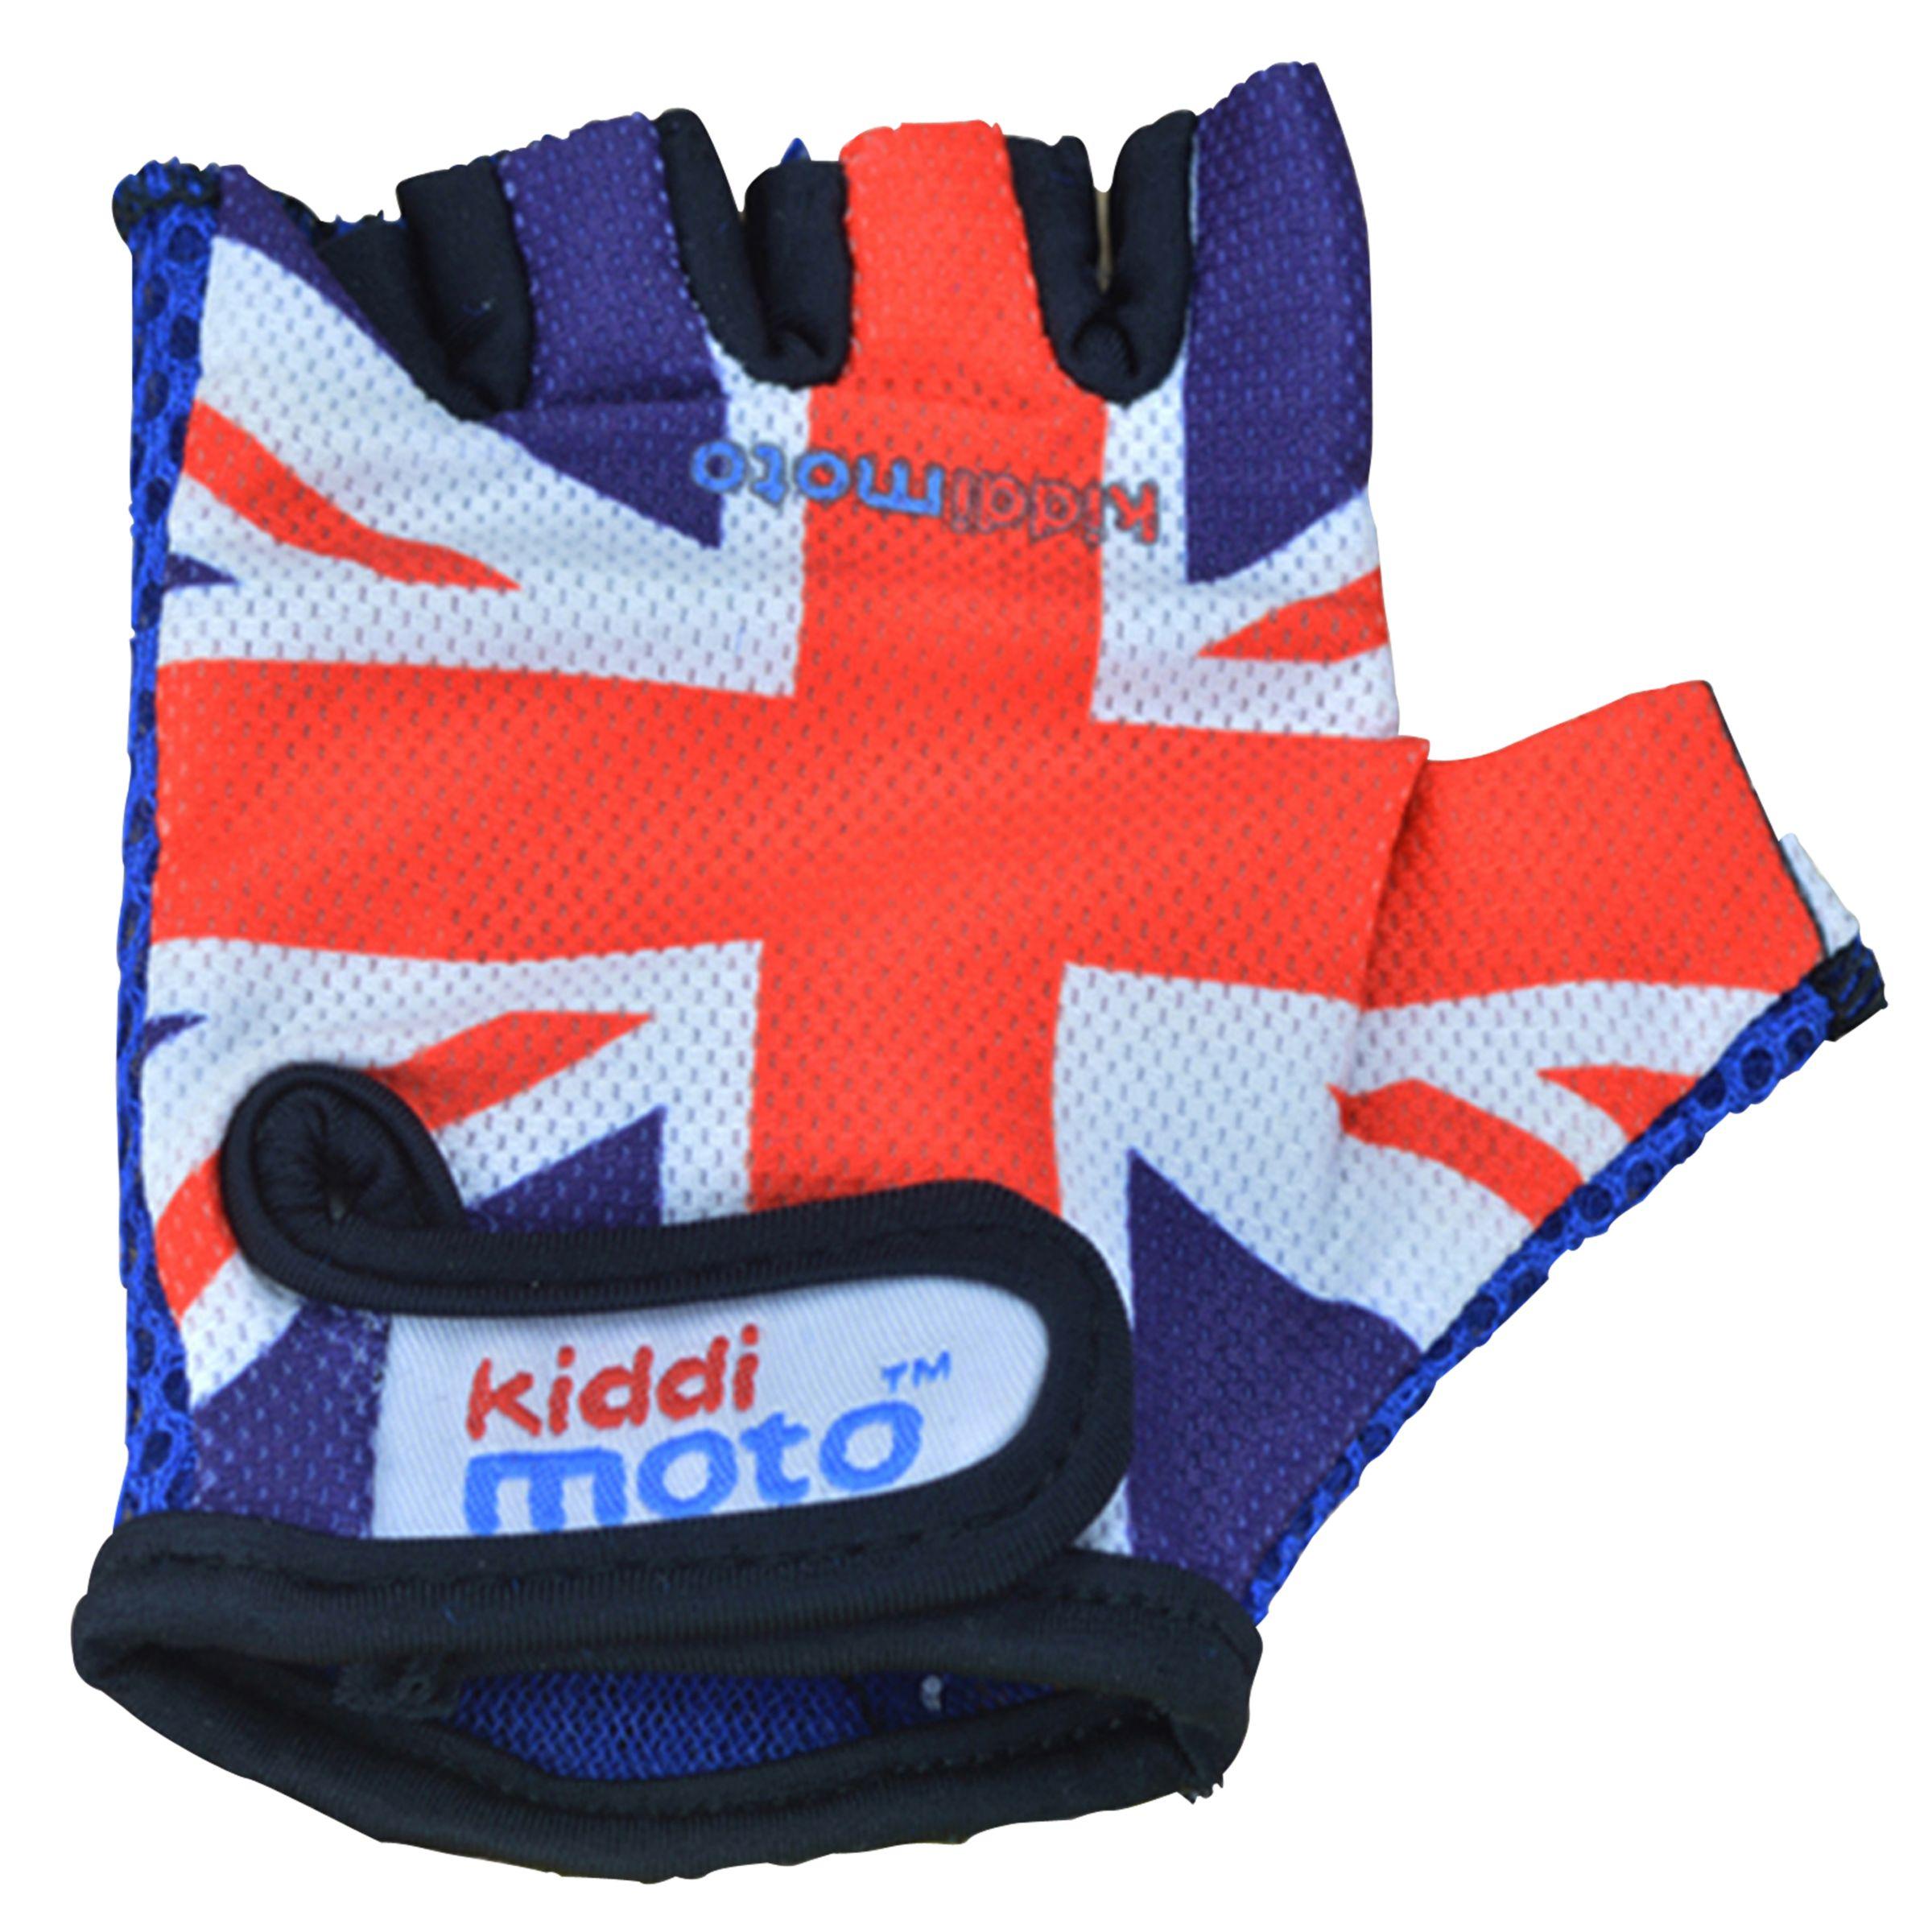 Kiddimoto Kiddimoto Union Jack Gloves, Small